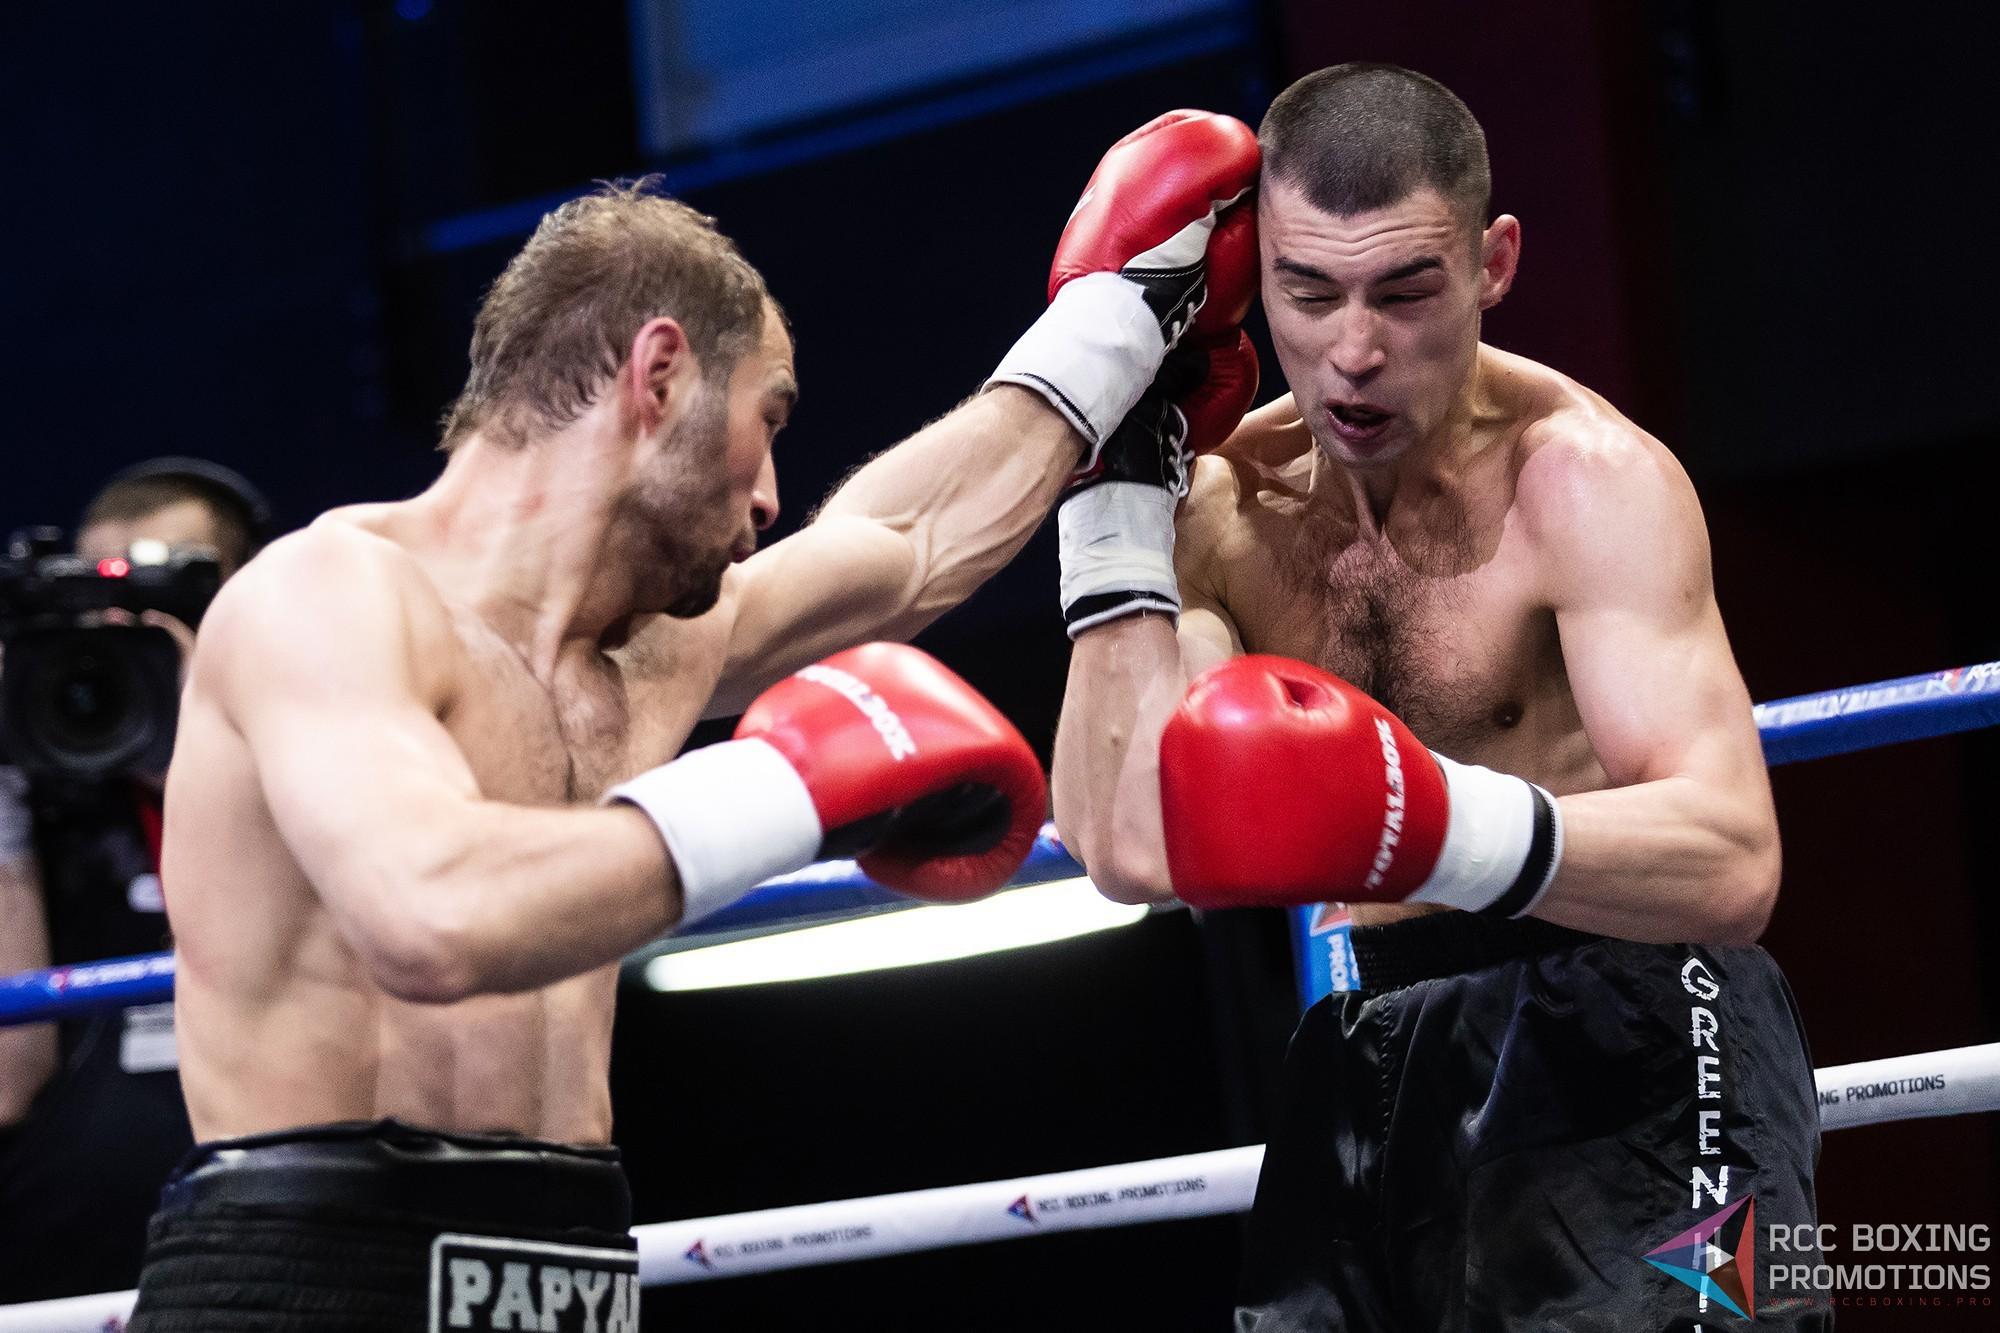 Галкин бокс промоушн тимашевск фото